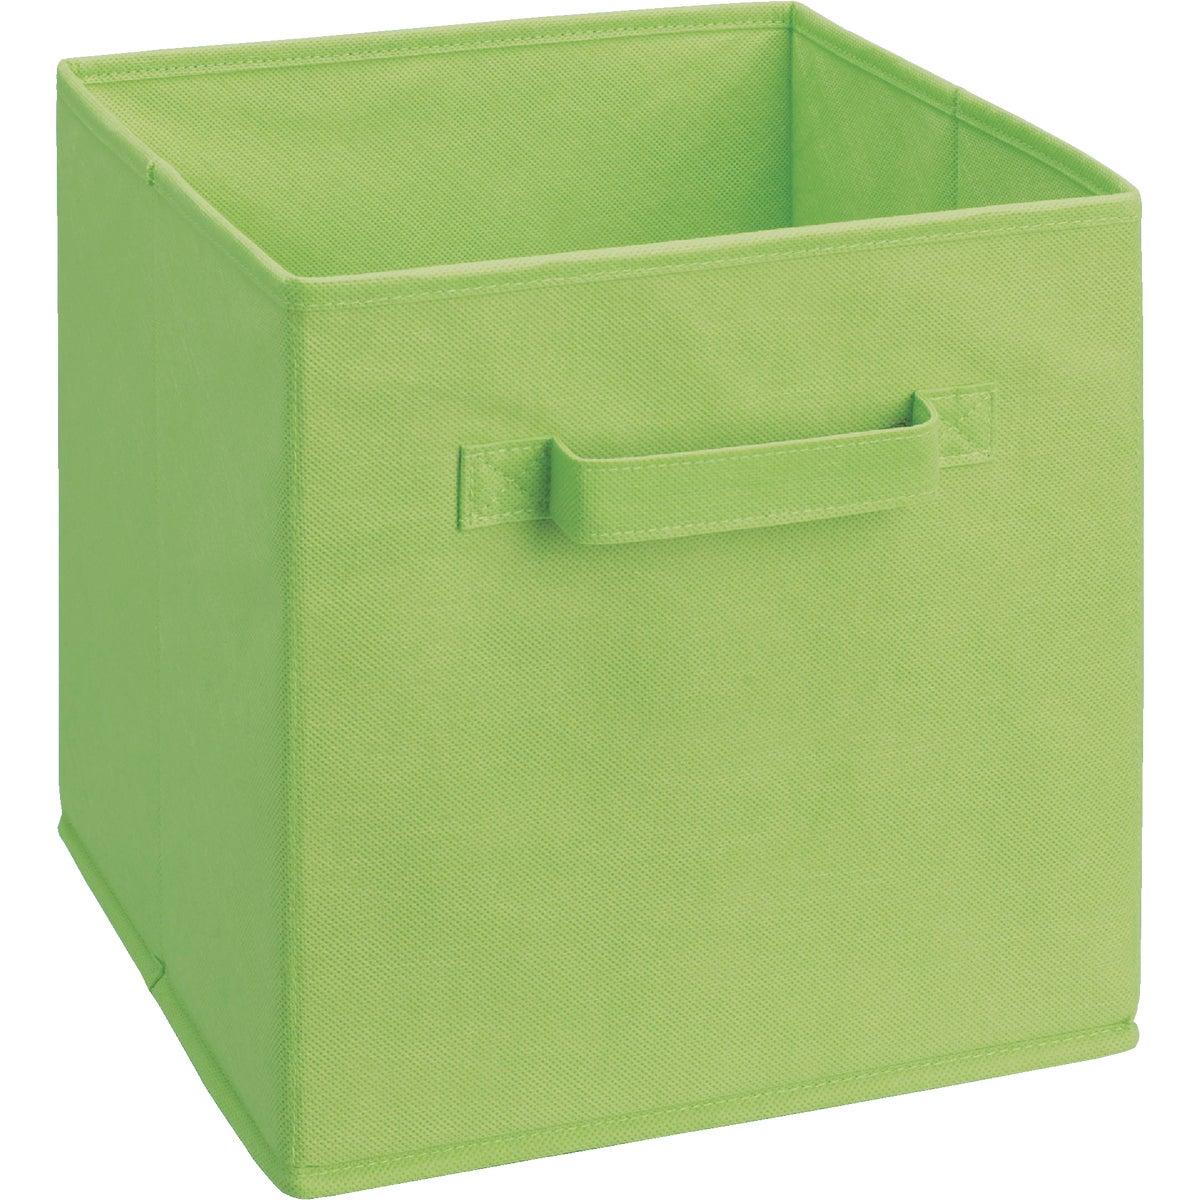 GREEN FABRIC DRAWER